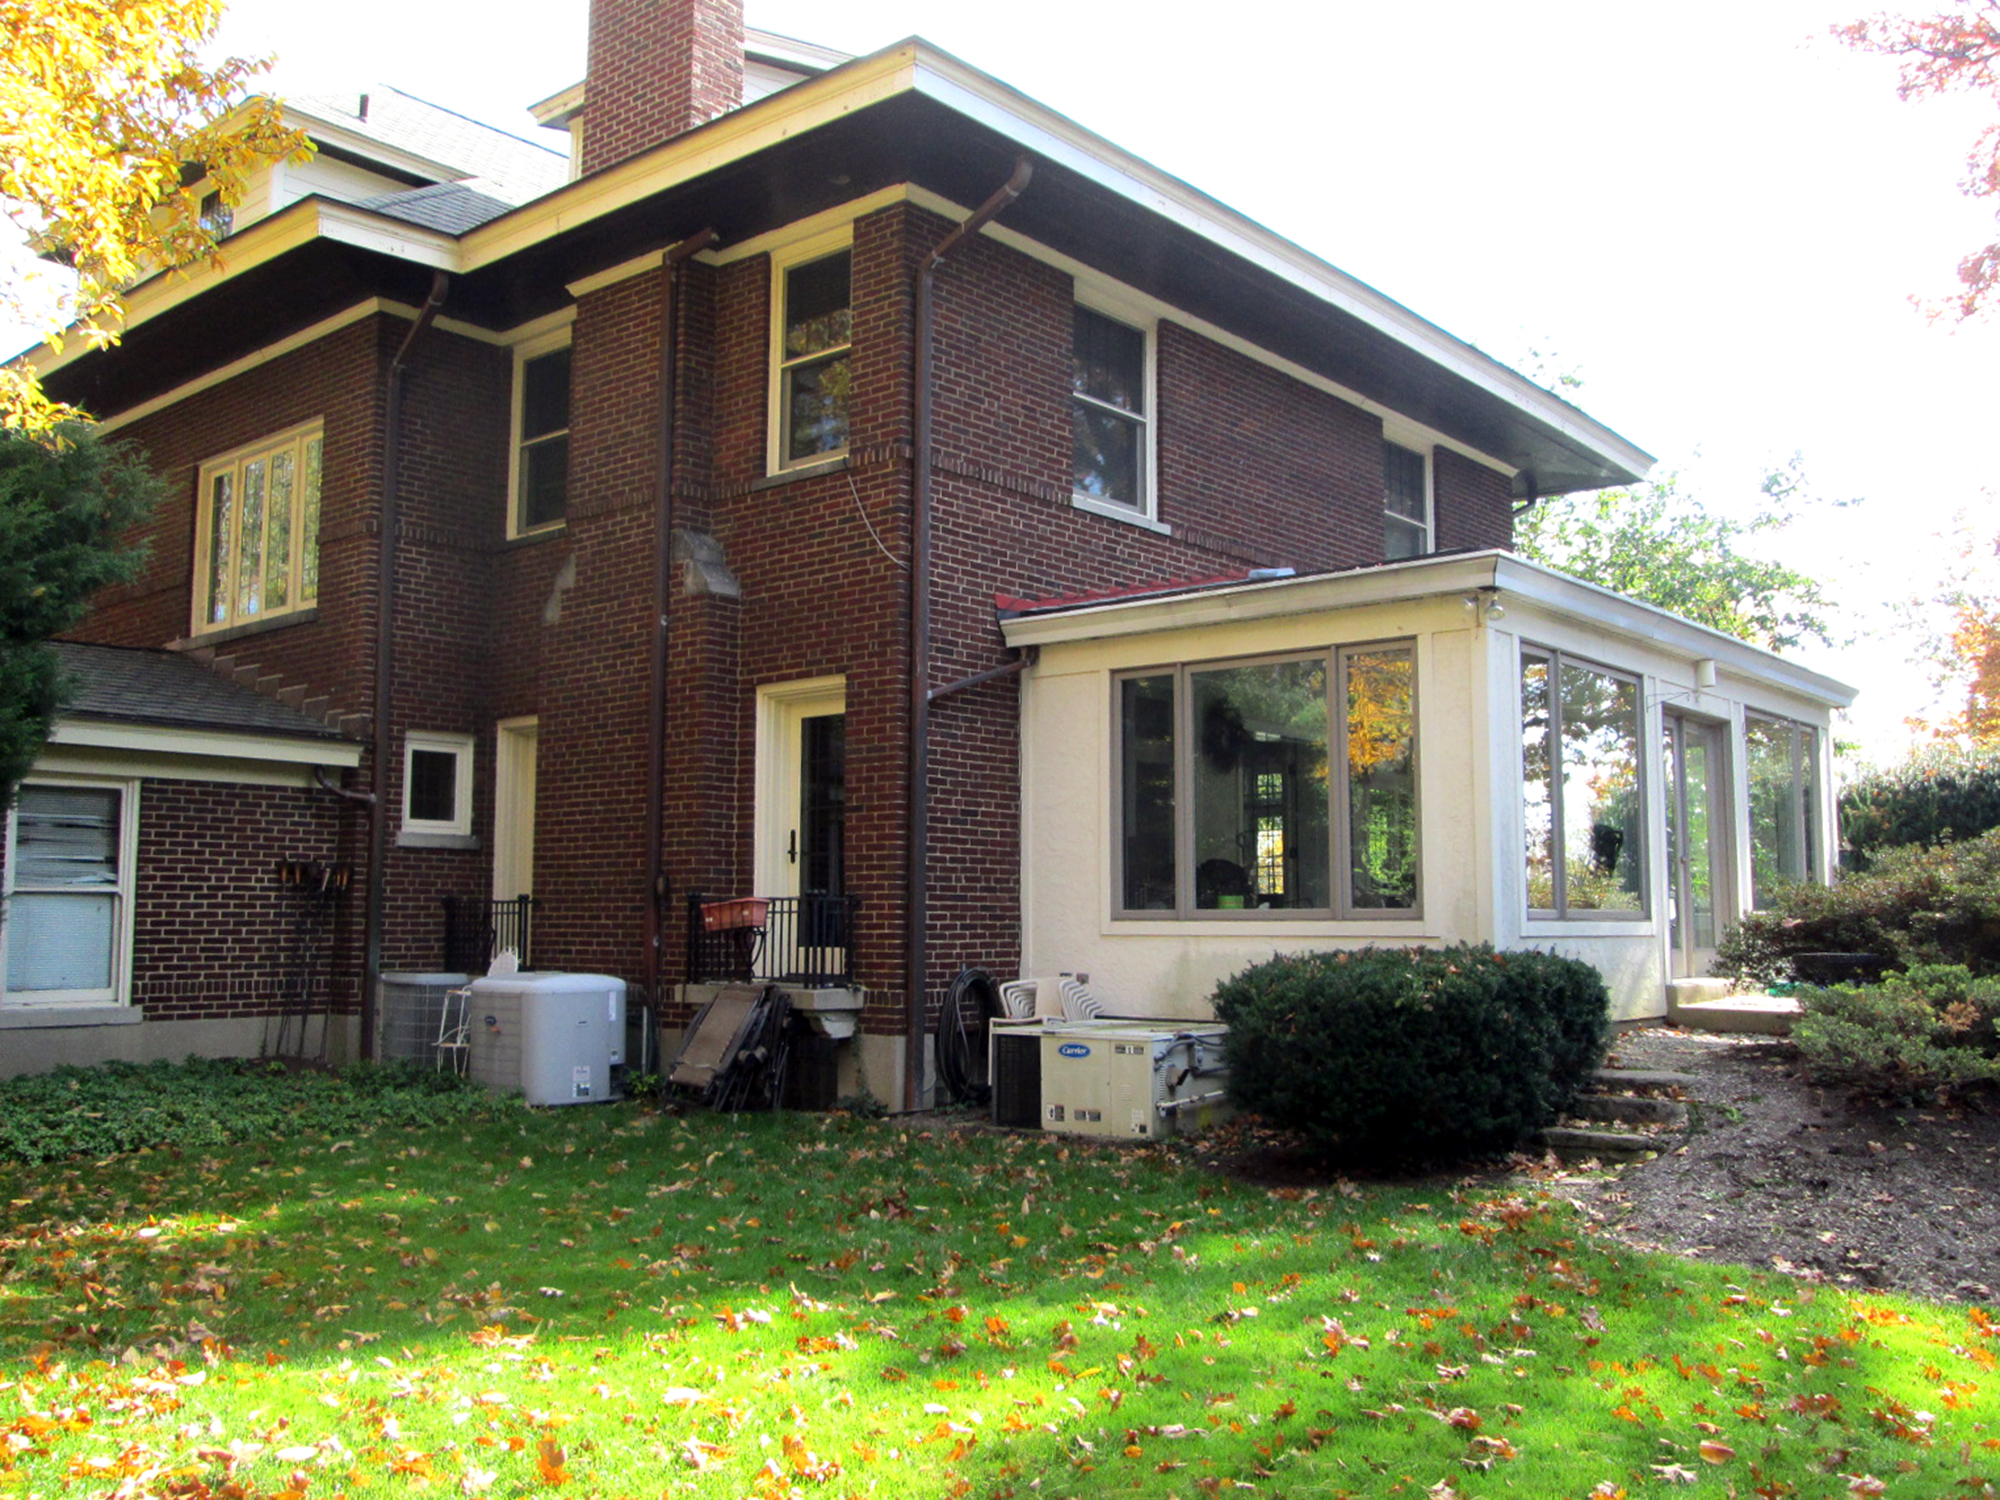 Rear view existing enclosed porch Cincinnati Residential Architecture